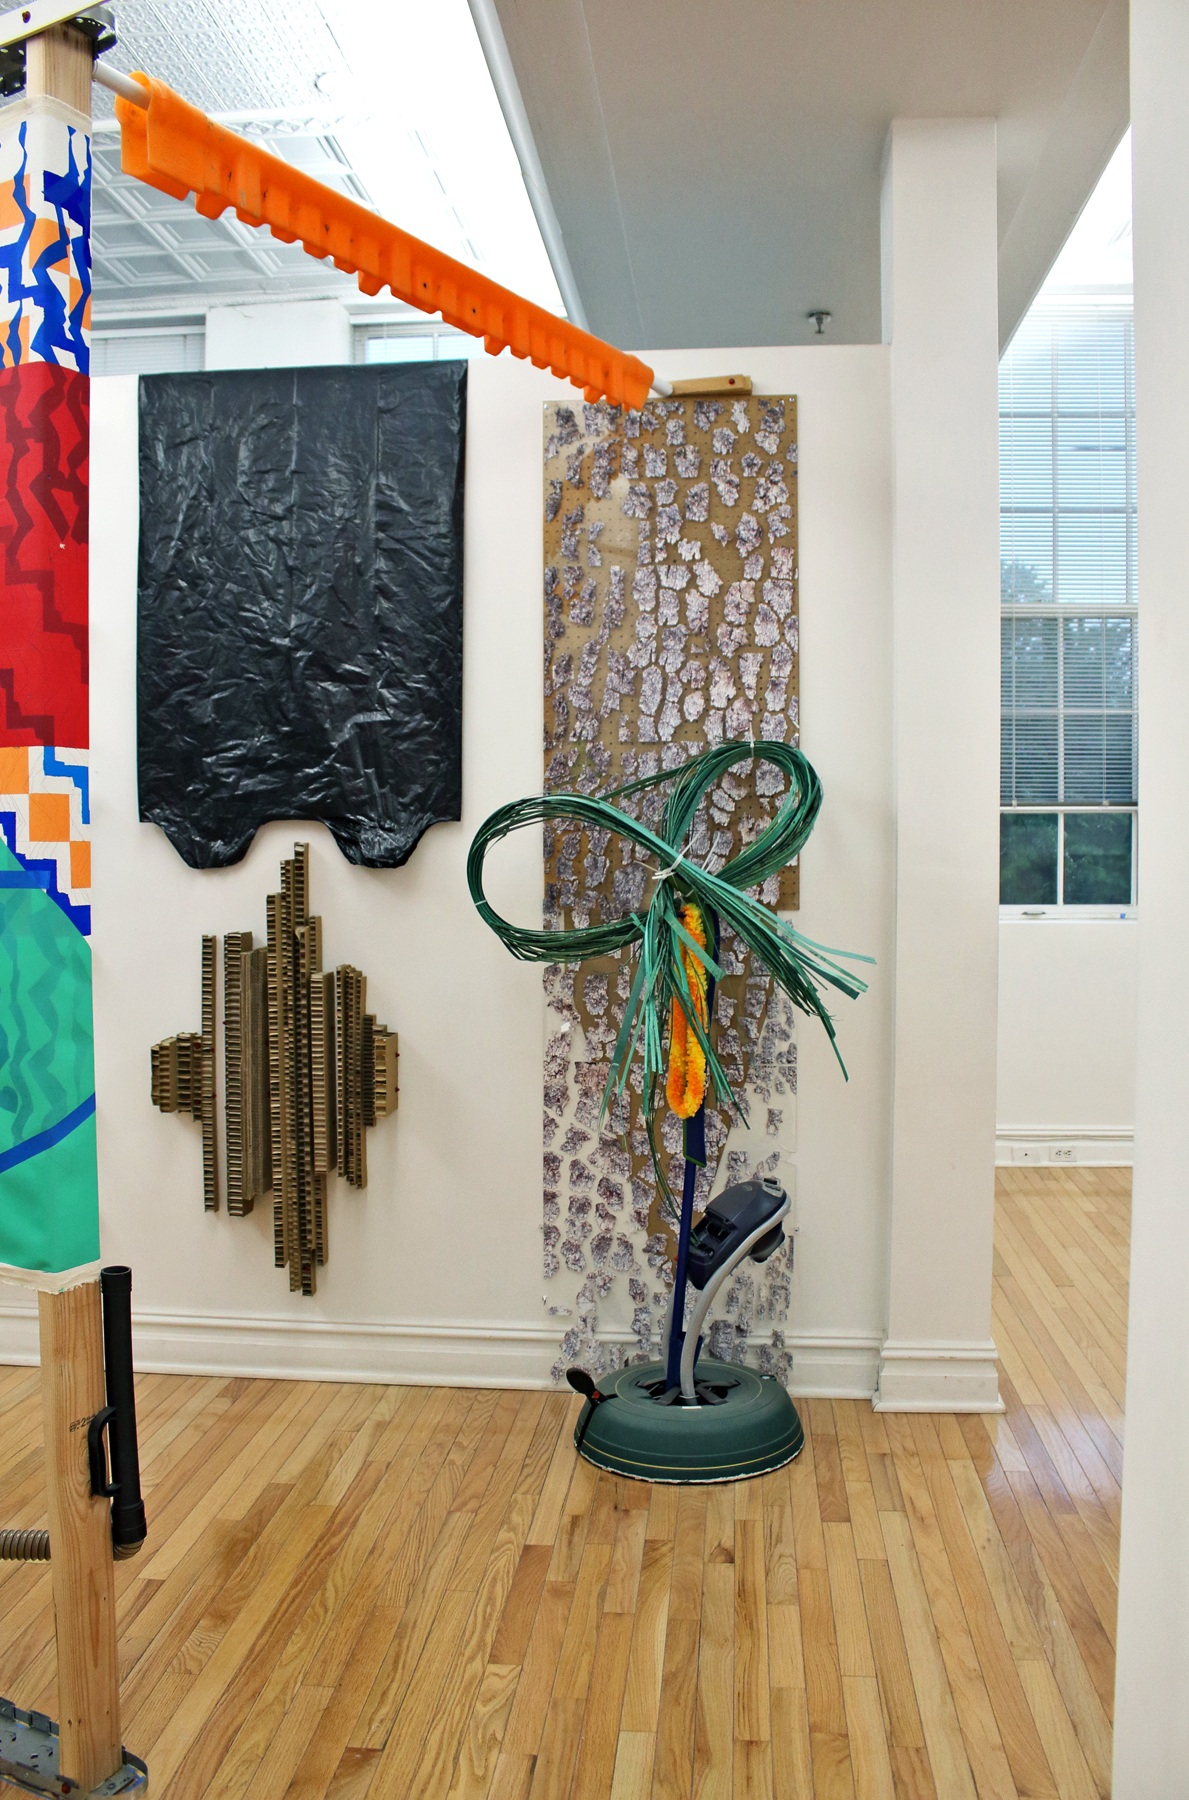 New Merz Works  Installation  Center for Contemporary Art, Bedminster NJ  2018